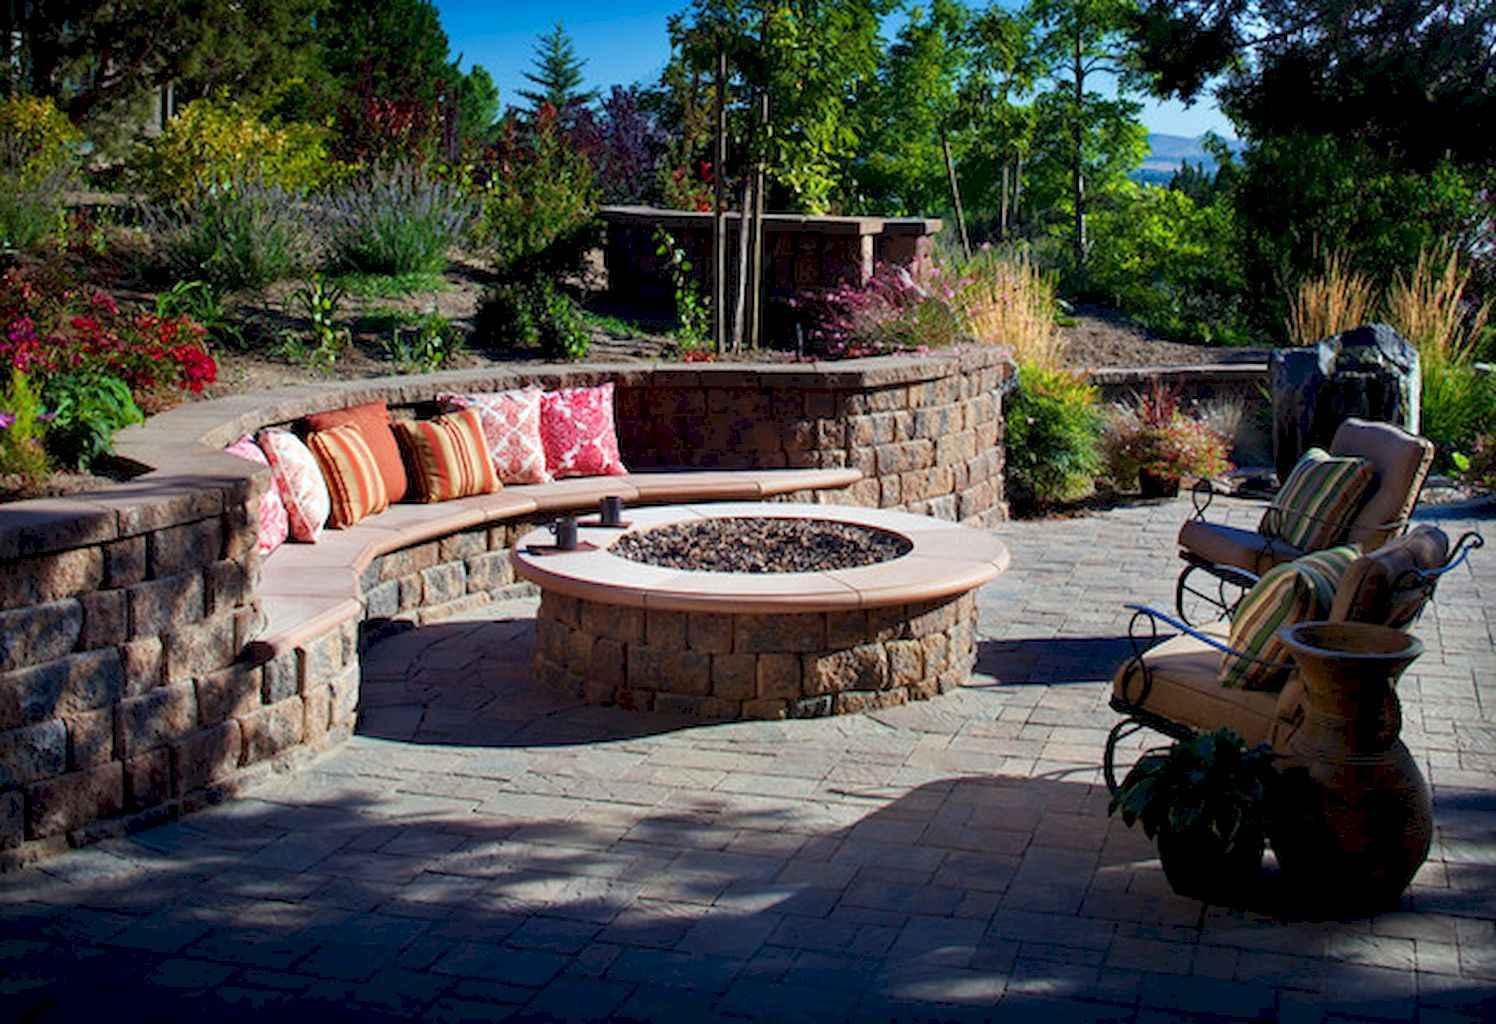 60 Beautiful Backyard Fire Pit Ideas Decoration and Remodel (53)